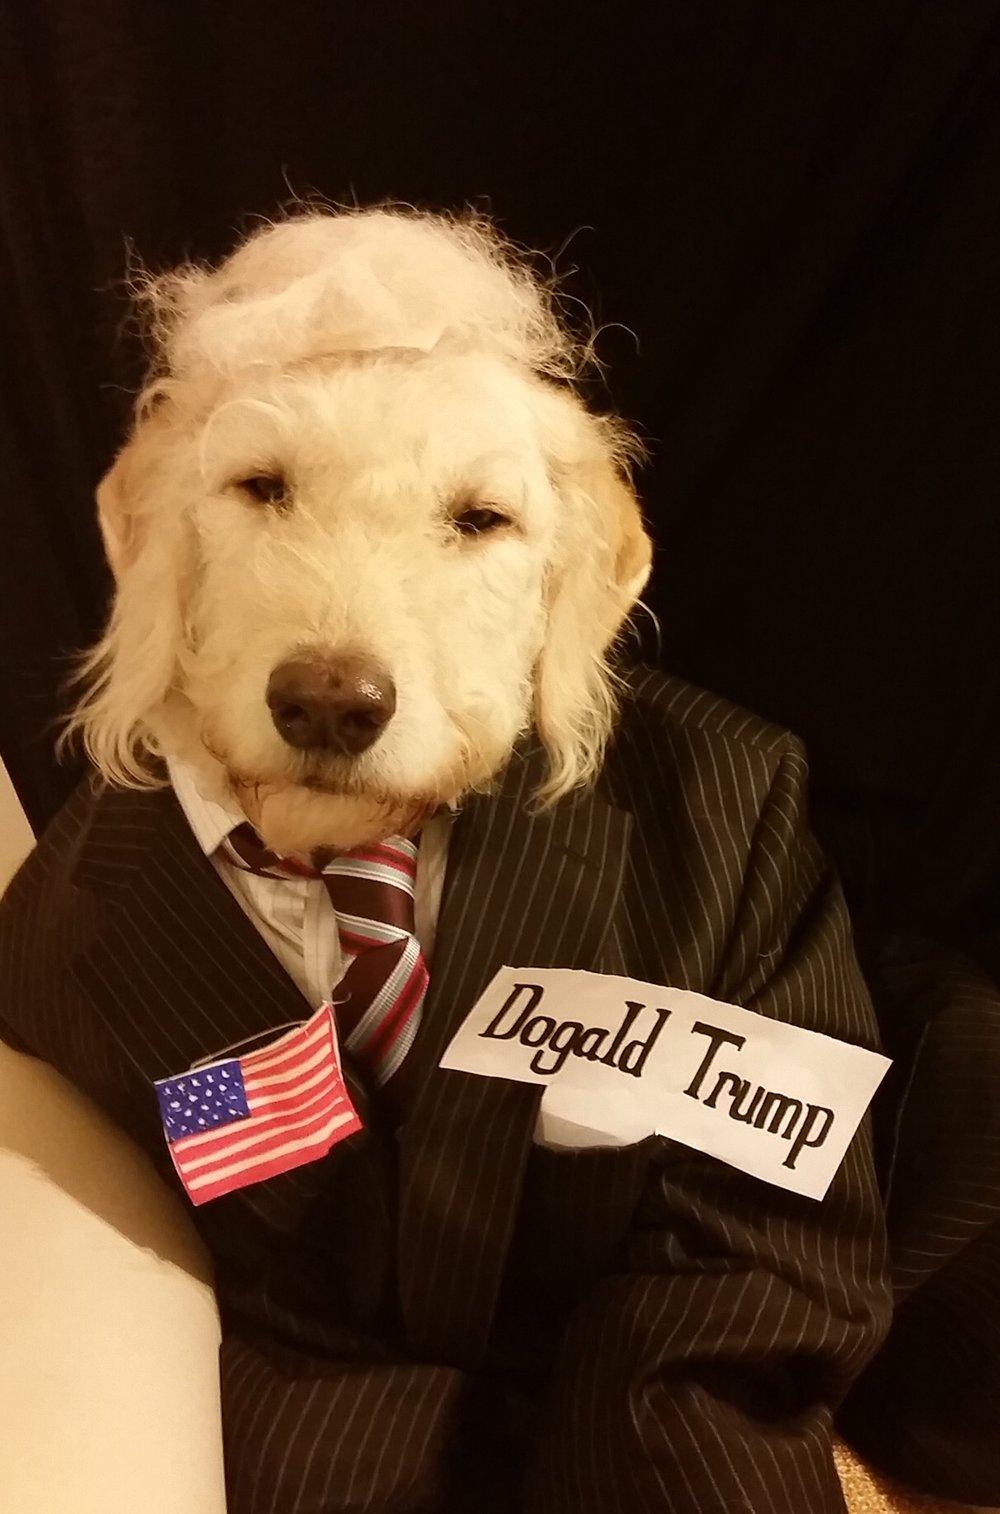 Margie-Dogald Trump.jpg